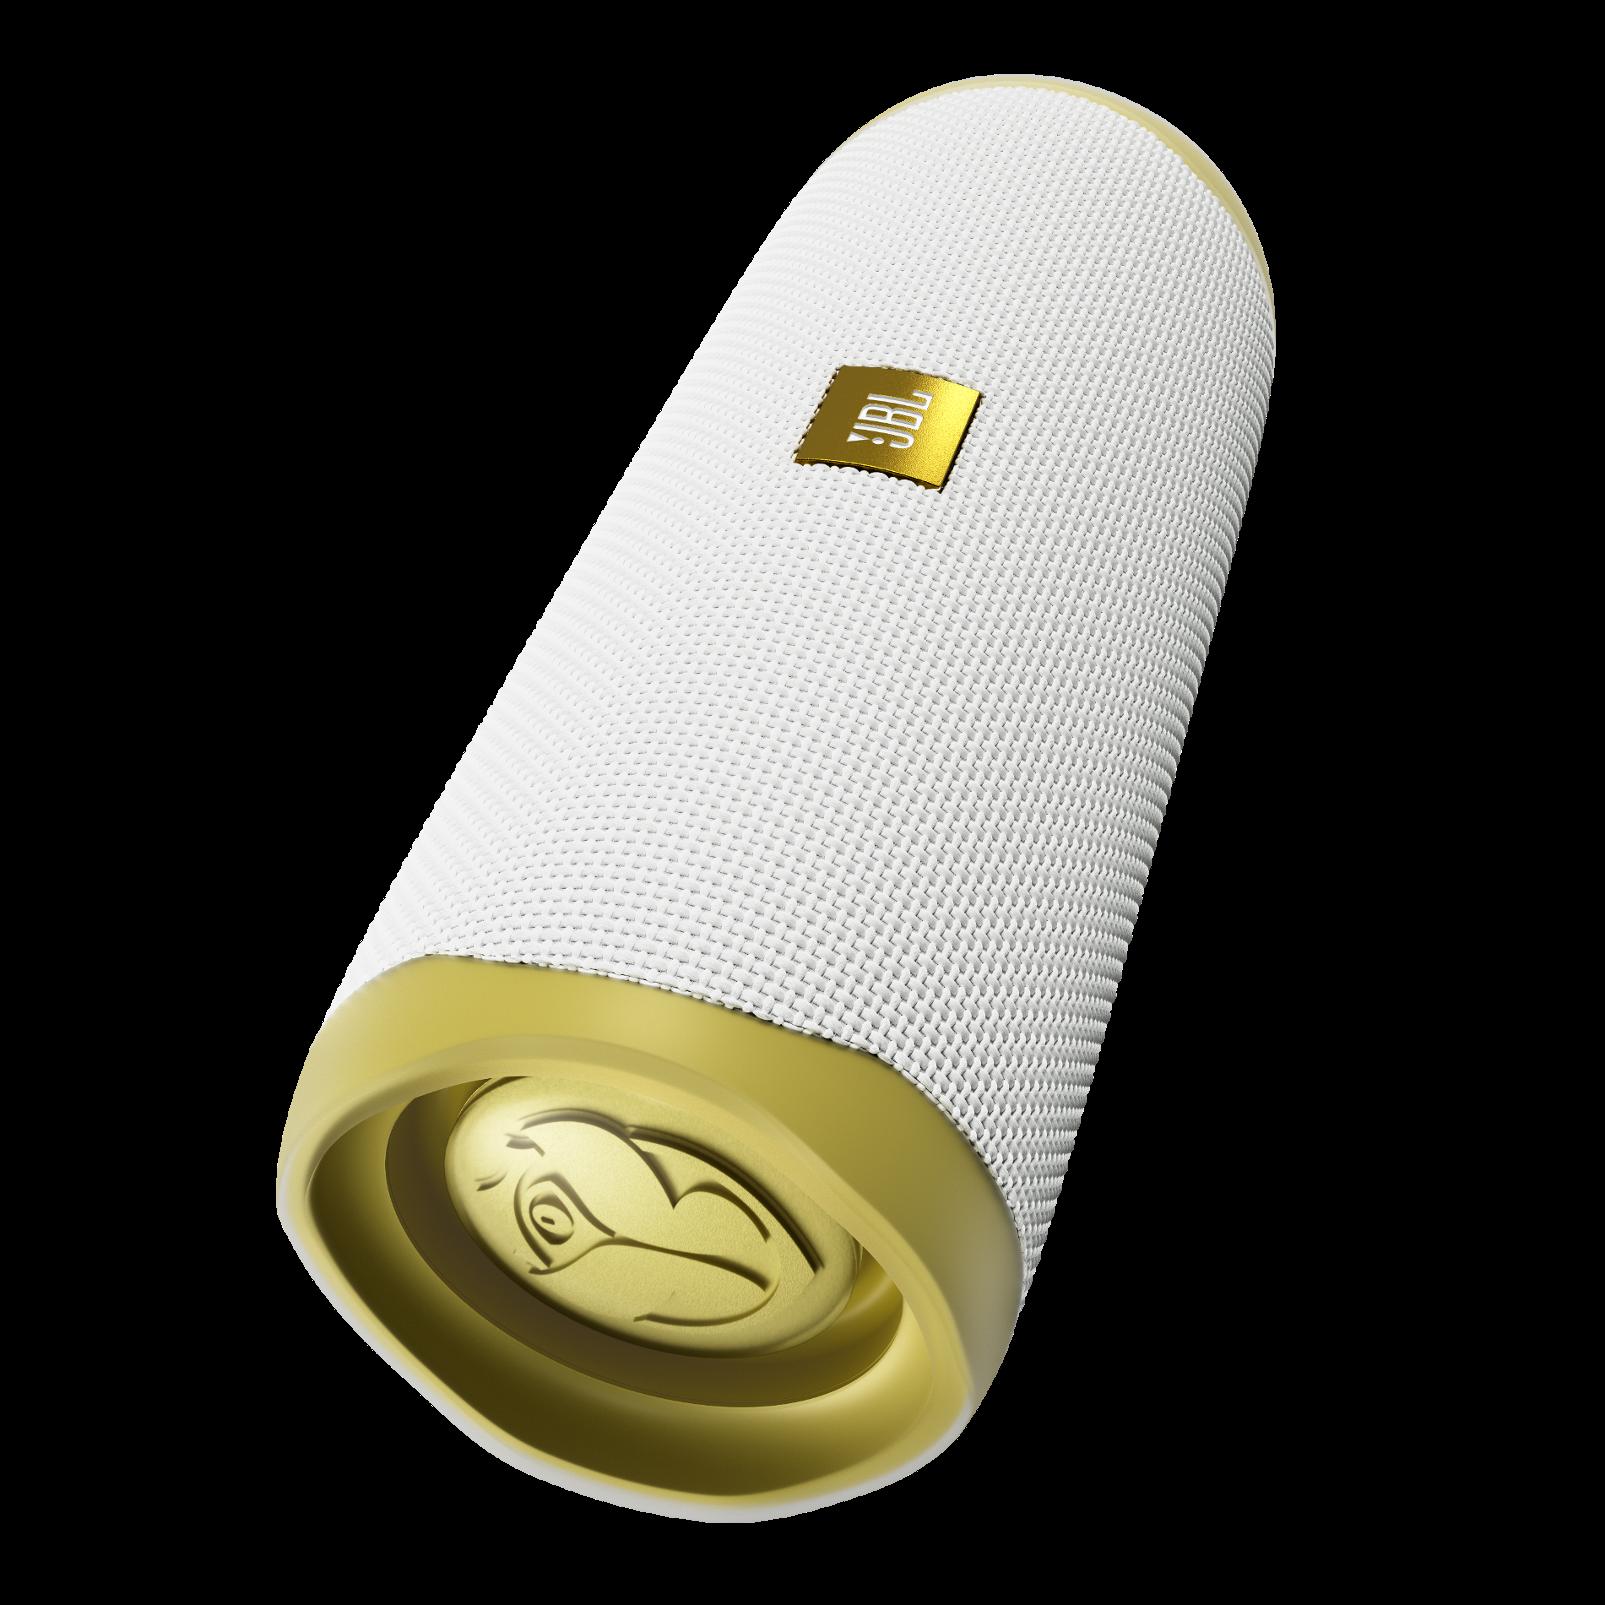 JBL Flip 5 Tomorrowland Edition - Gold/White - Portable Waterproof Speaker - Hero